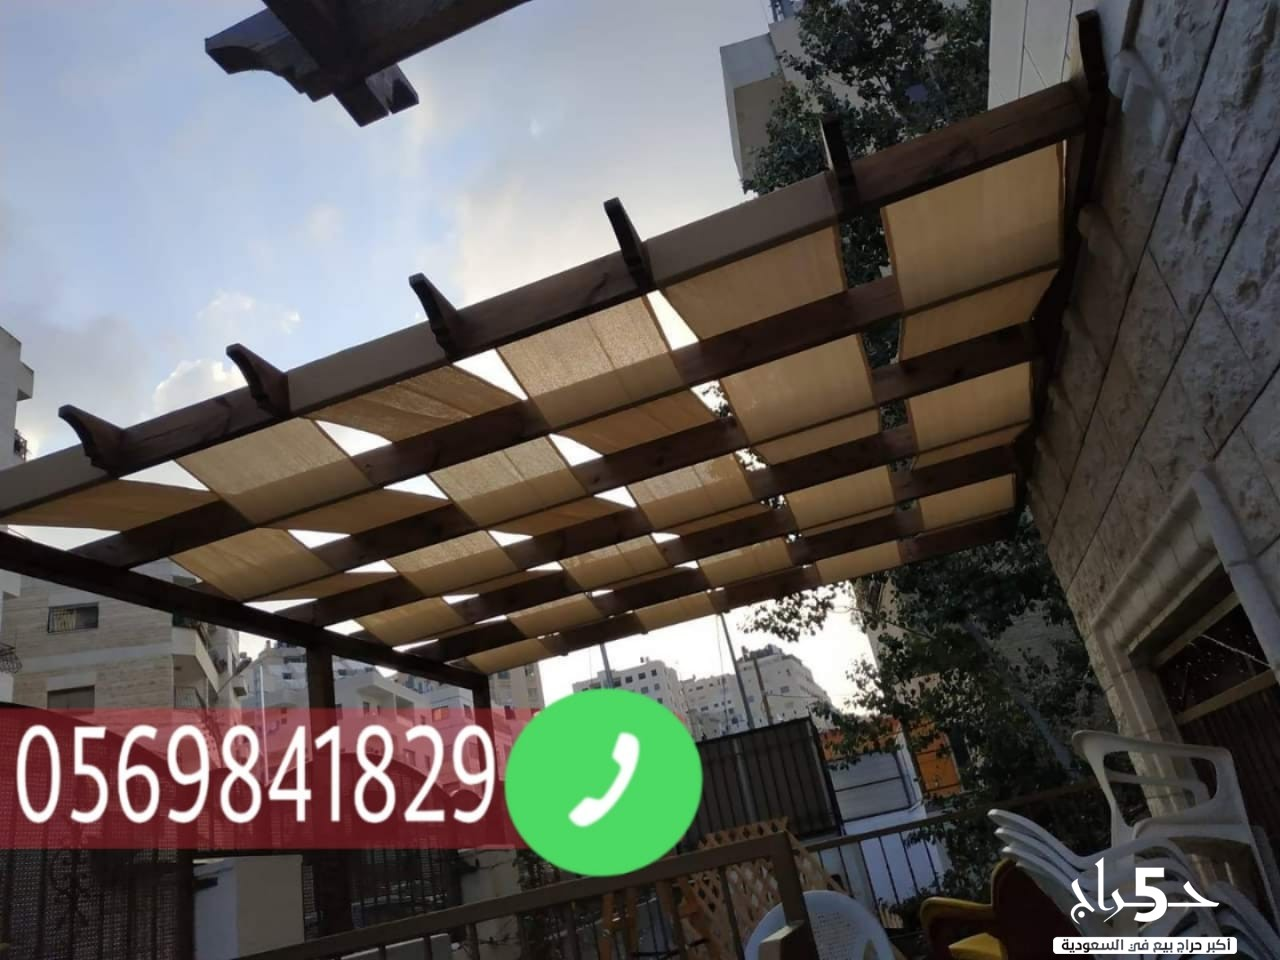 تنفيذ مشروعات مظلات وسواتر في الباحه 0569841829 مظلات بالطائف مظلات بالطائف مظلات مسابح بالطائف